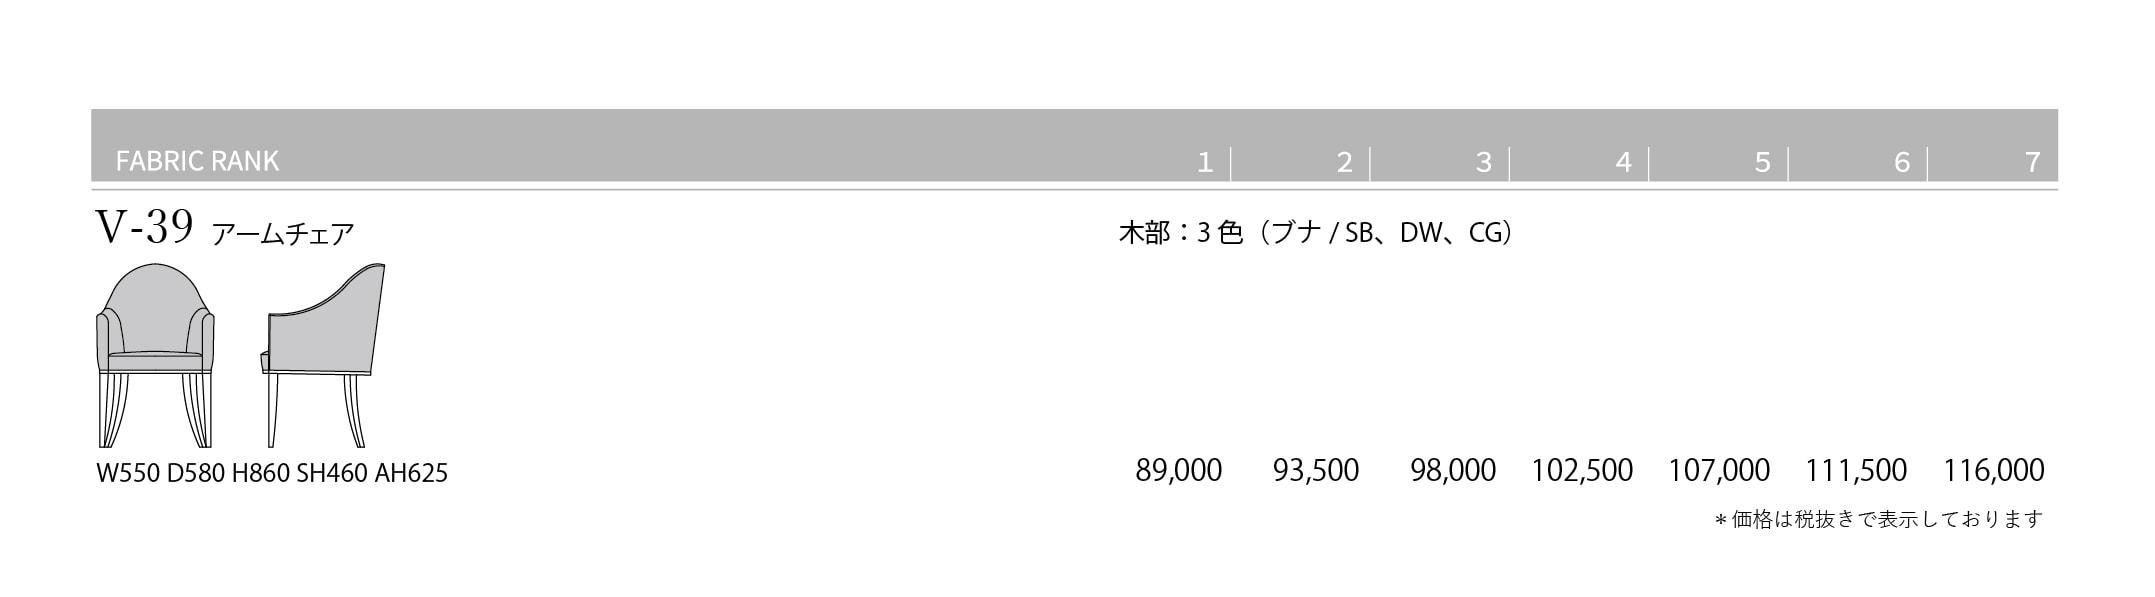 V-39 Price List